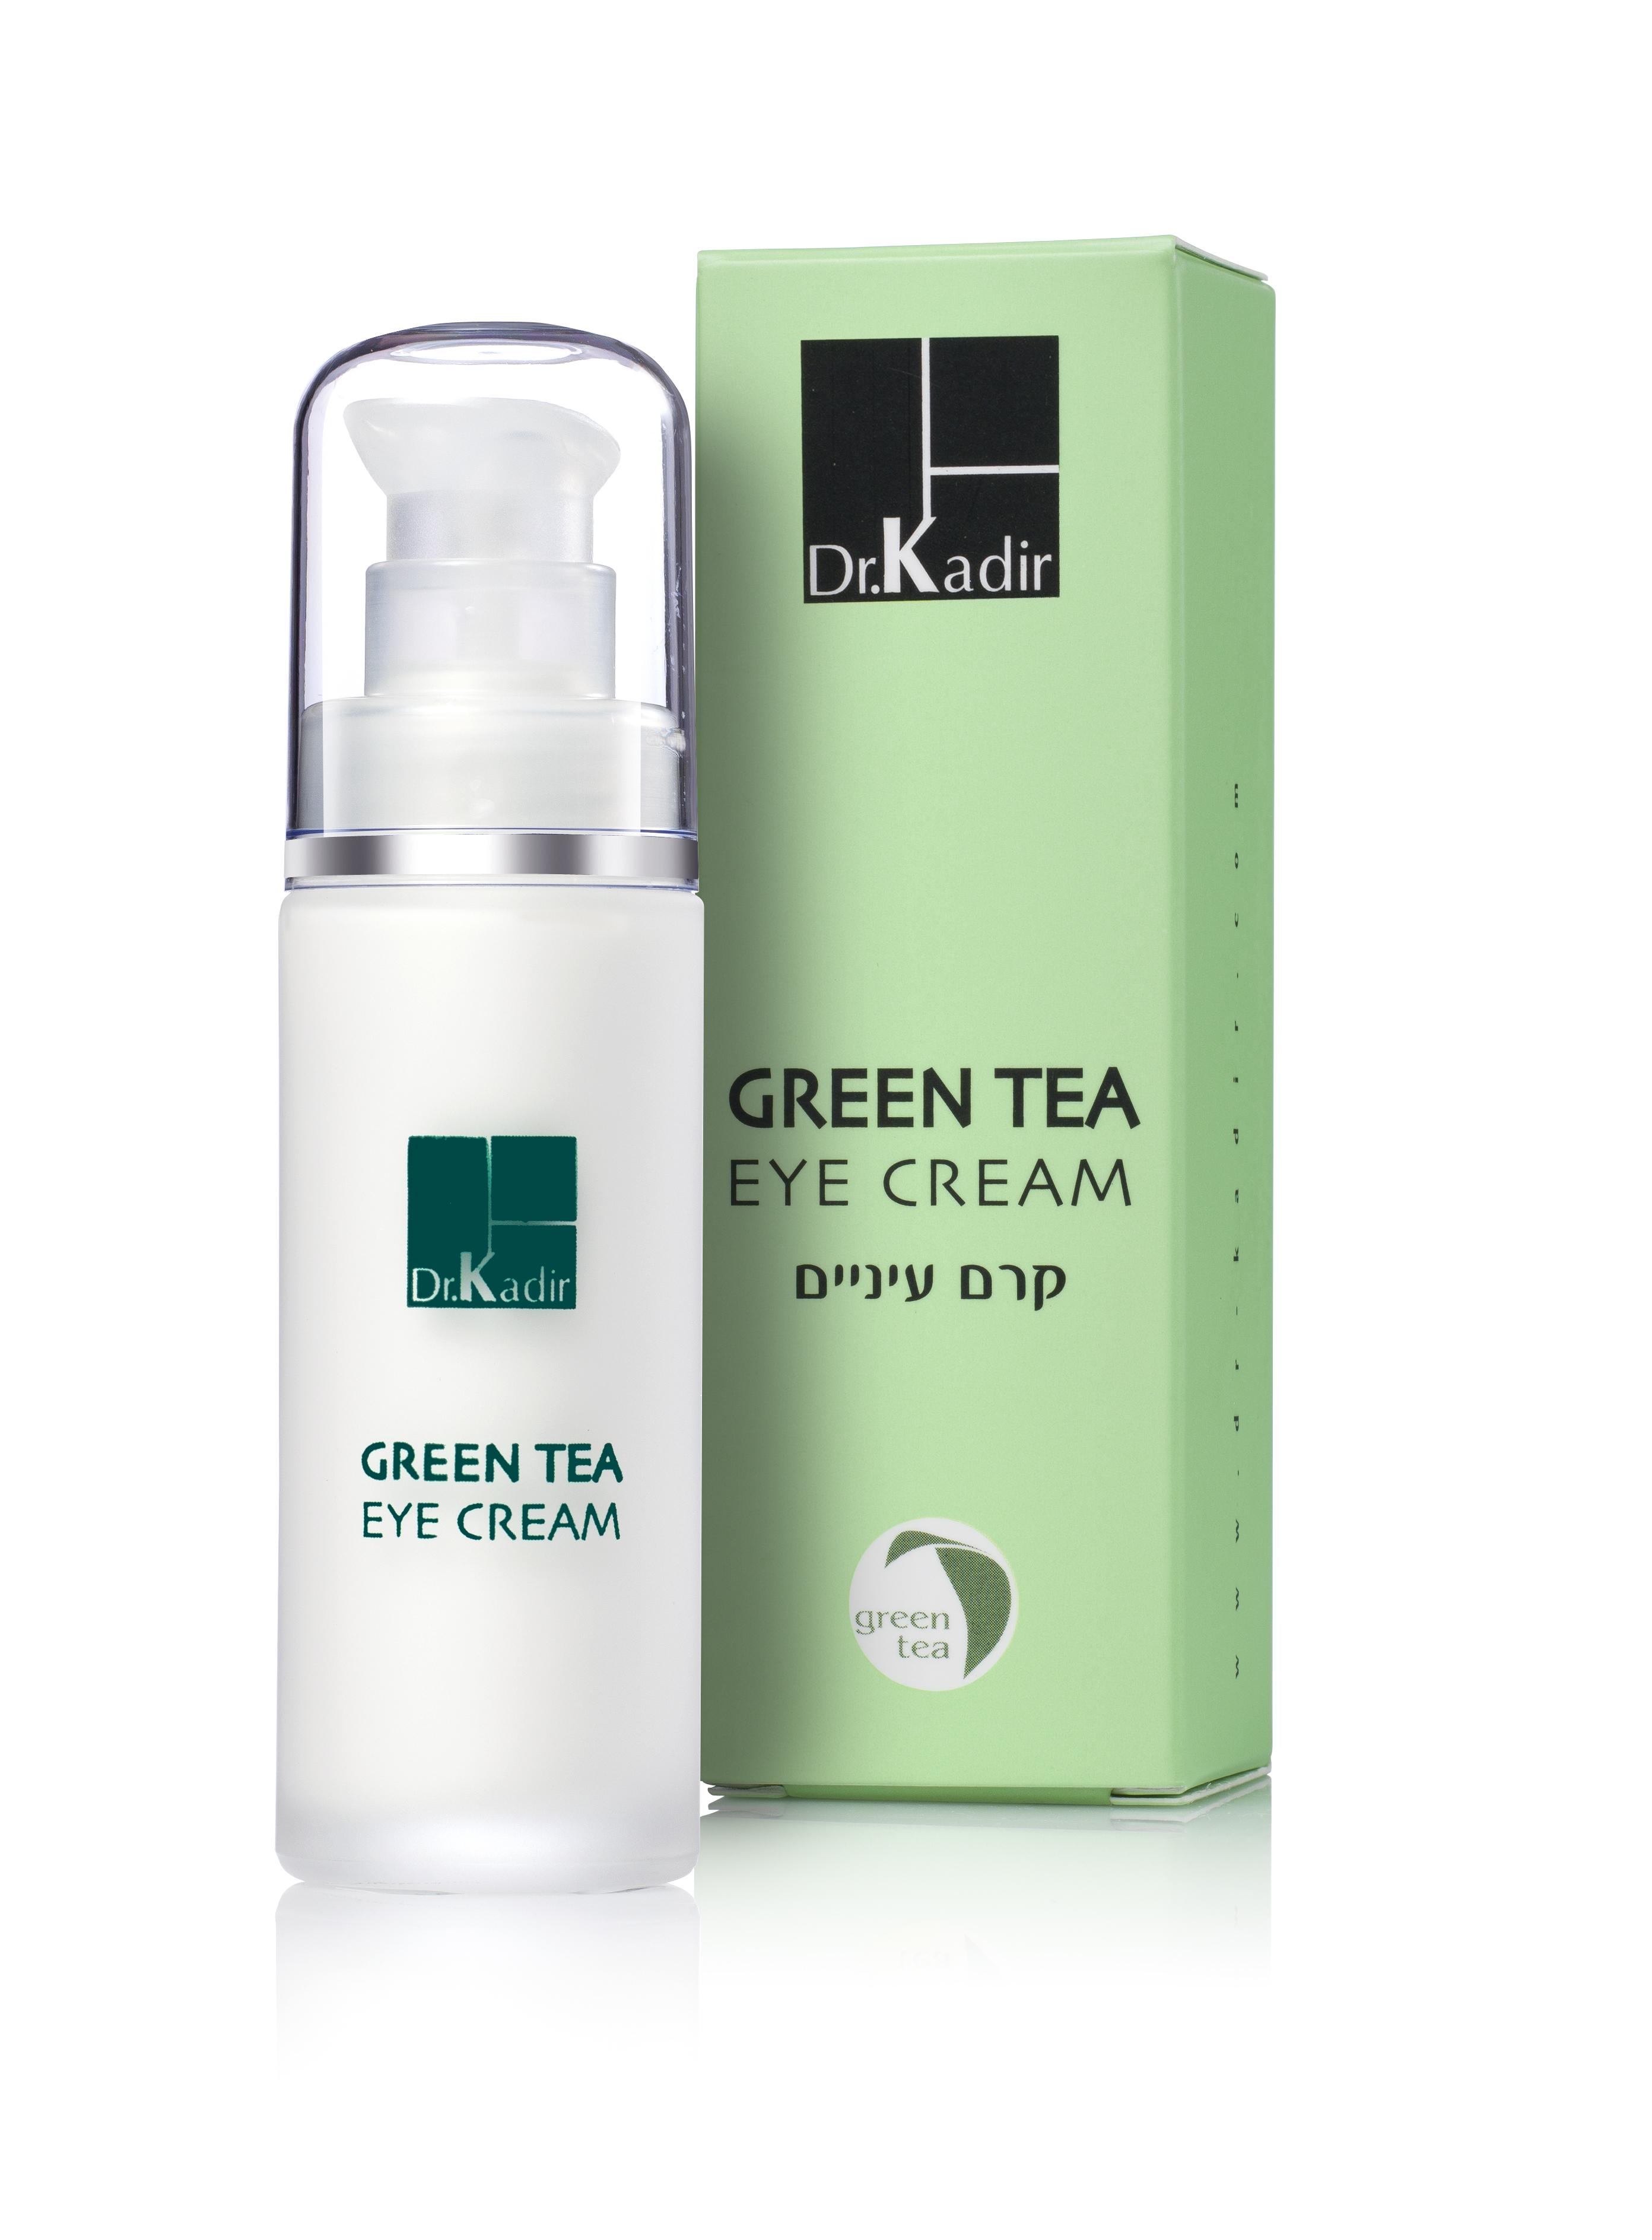 DR KADIR Крем под глаза Зеленый чай / CREAMS AND MOISTURIZERS 30 мл ahava time to hydrate нежный крем для глаз 15 мл